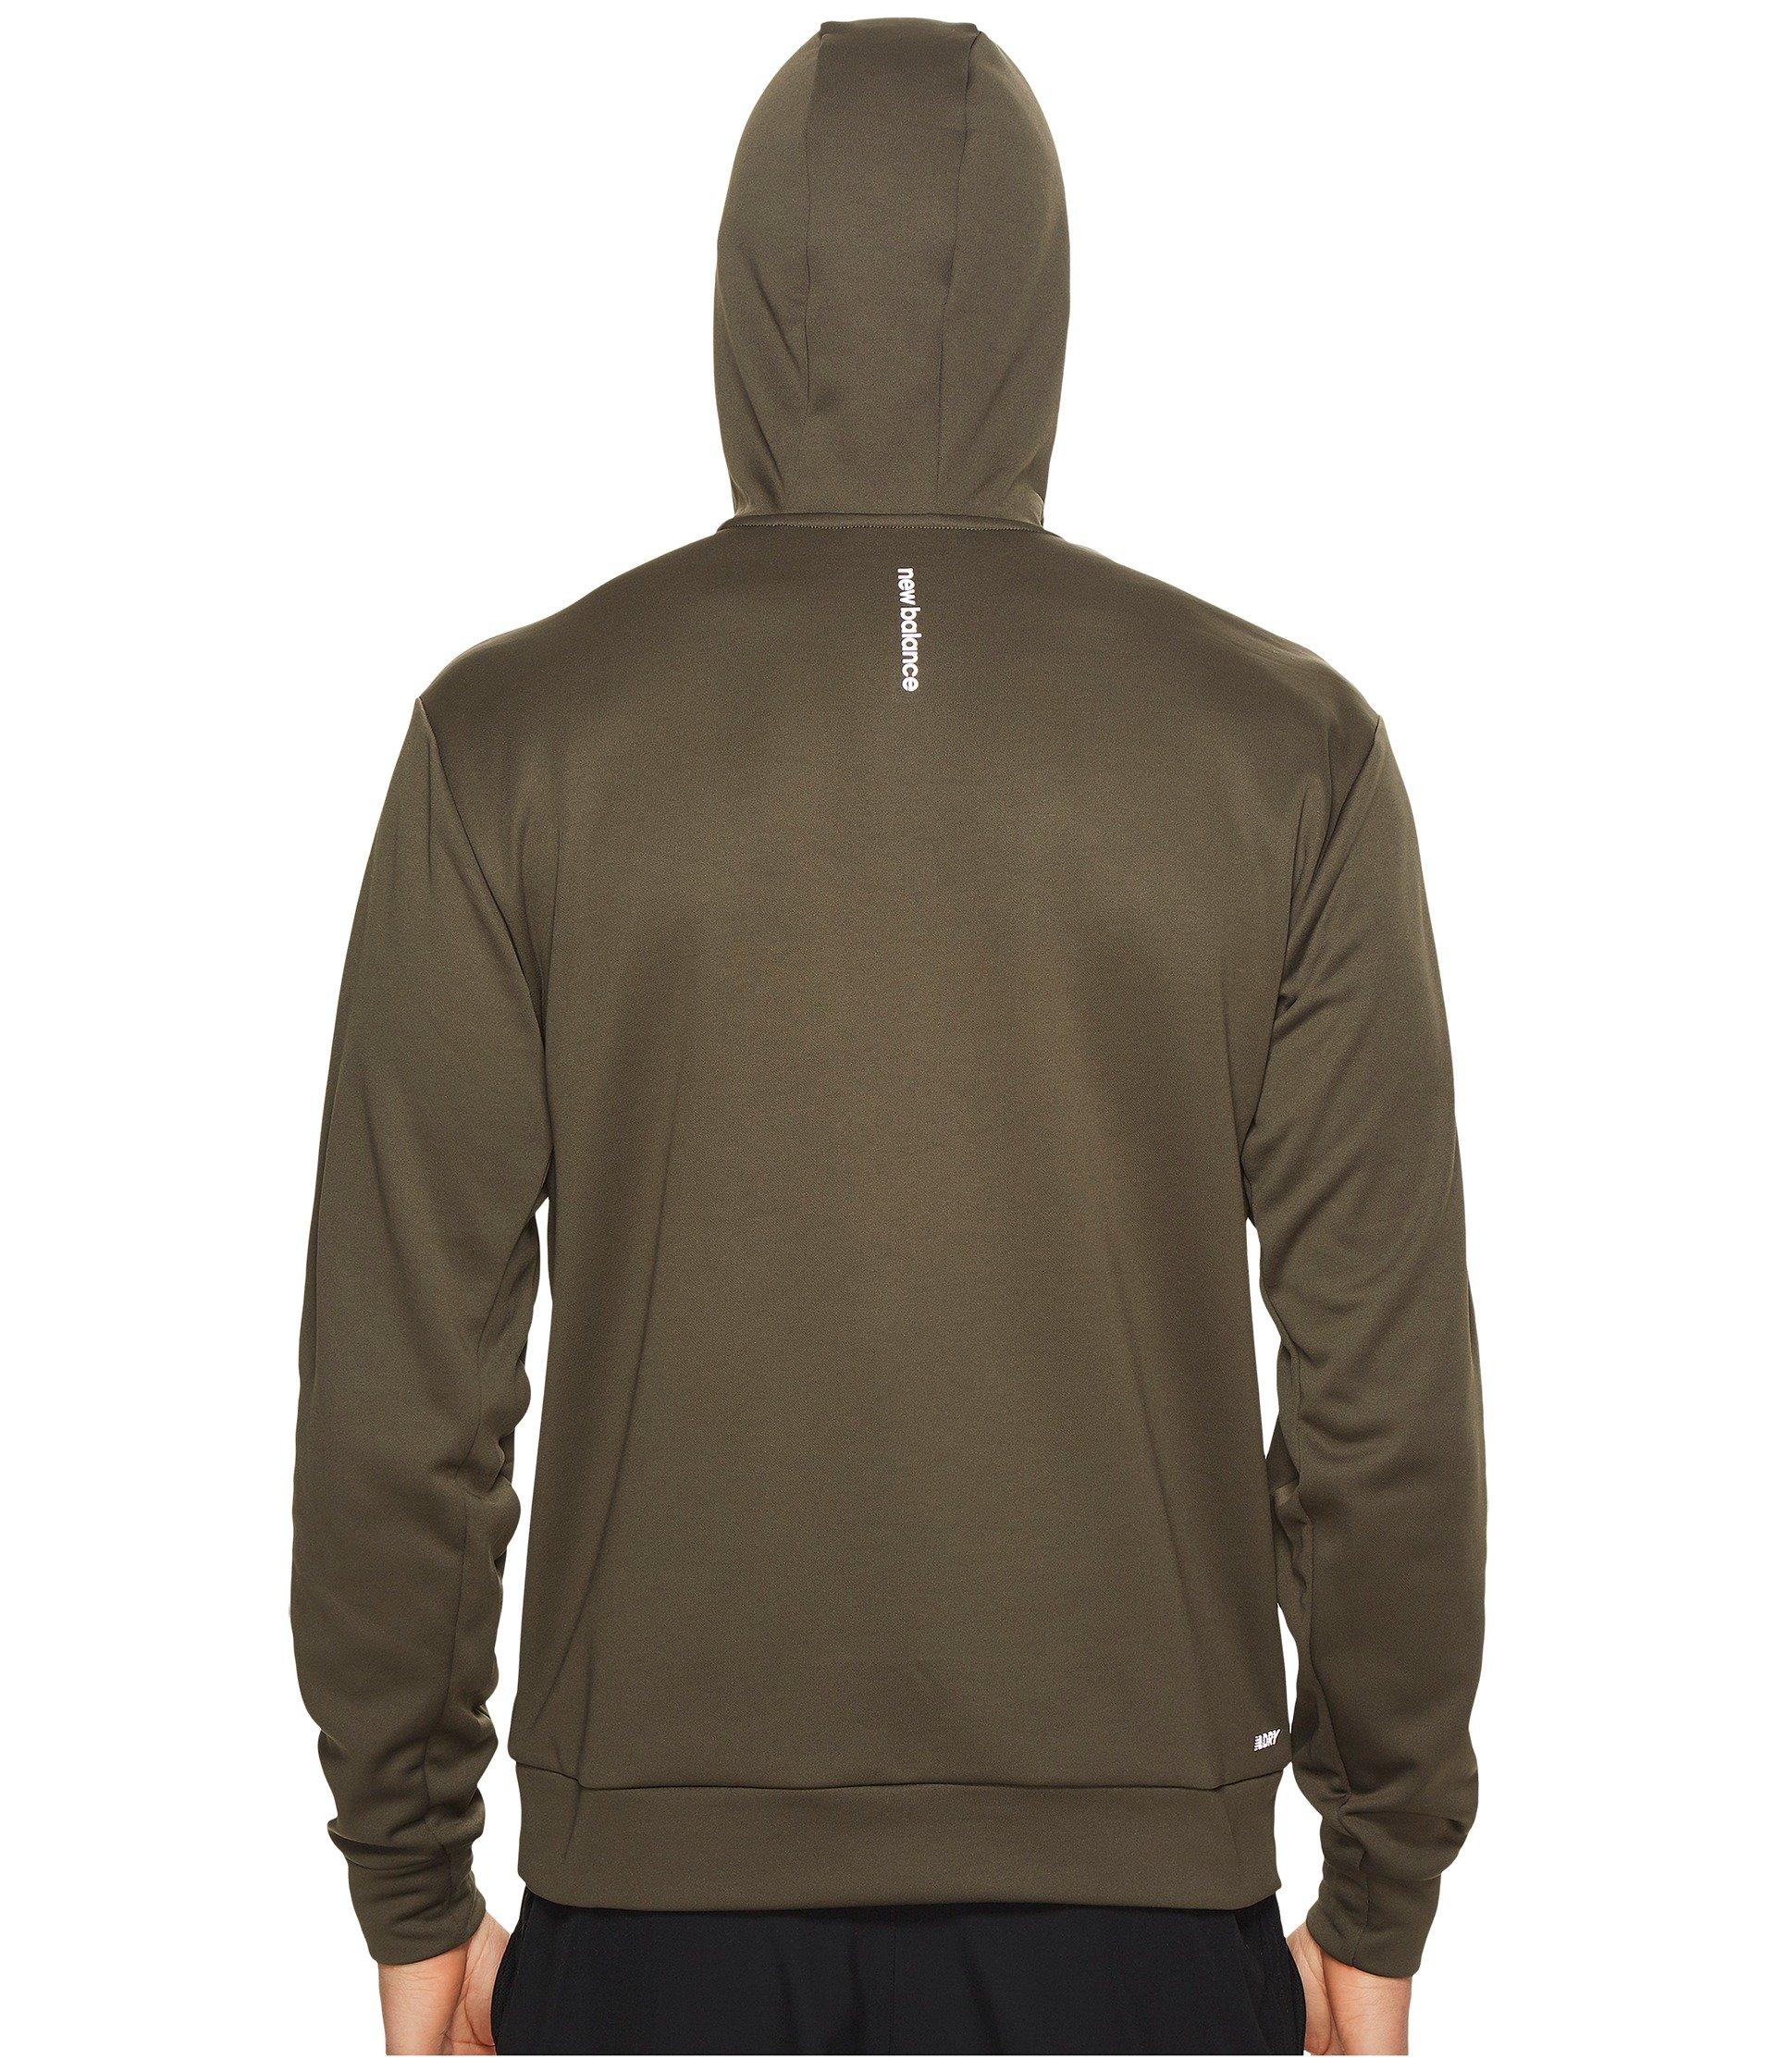 new balance game changer fleece hoodie at 6pm. Black Bedroom Furniture Sets. Home Design Ideas